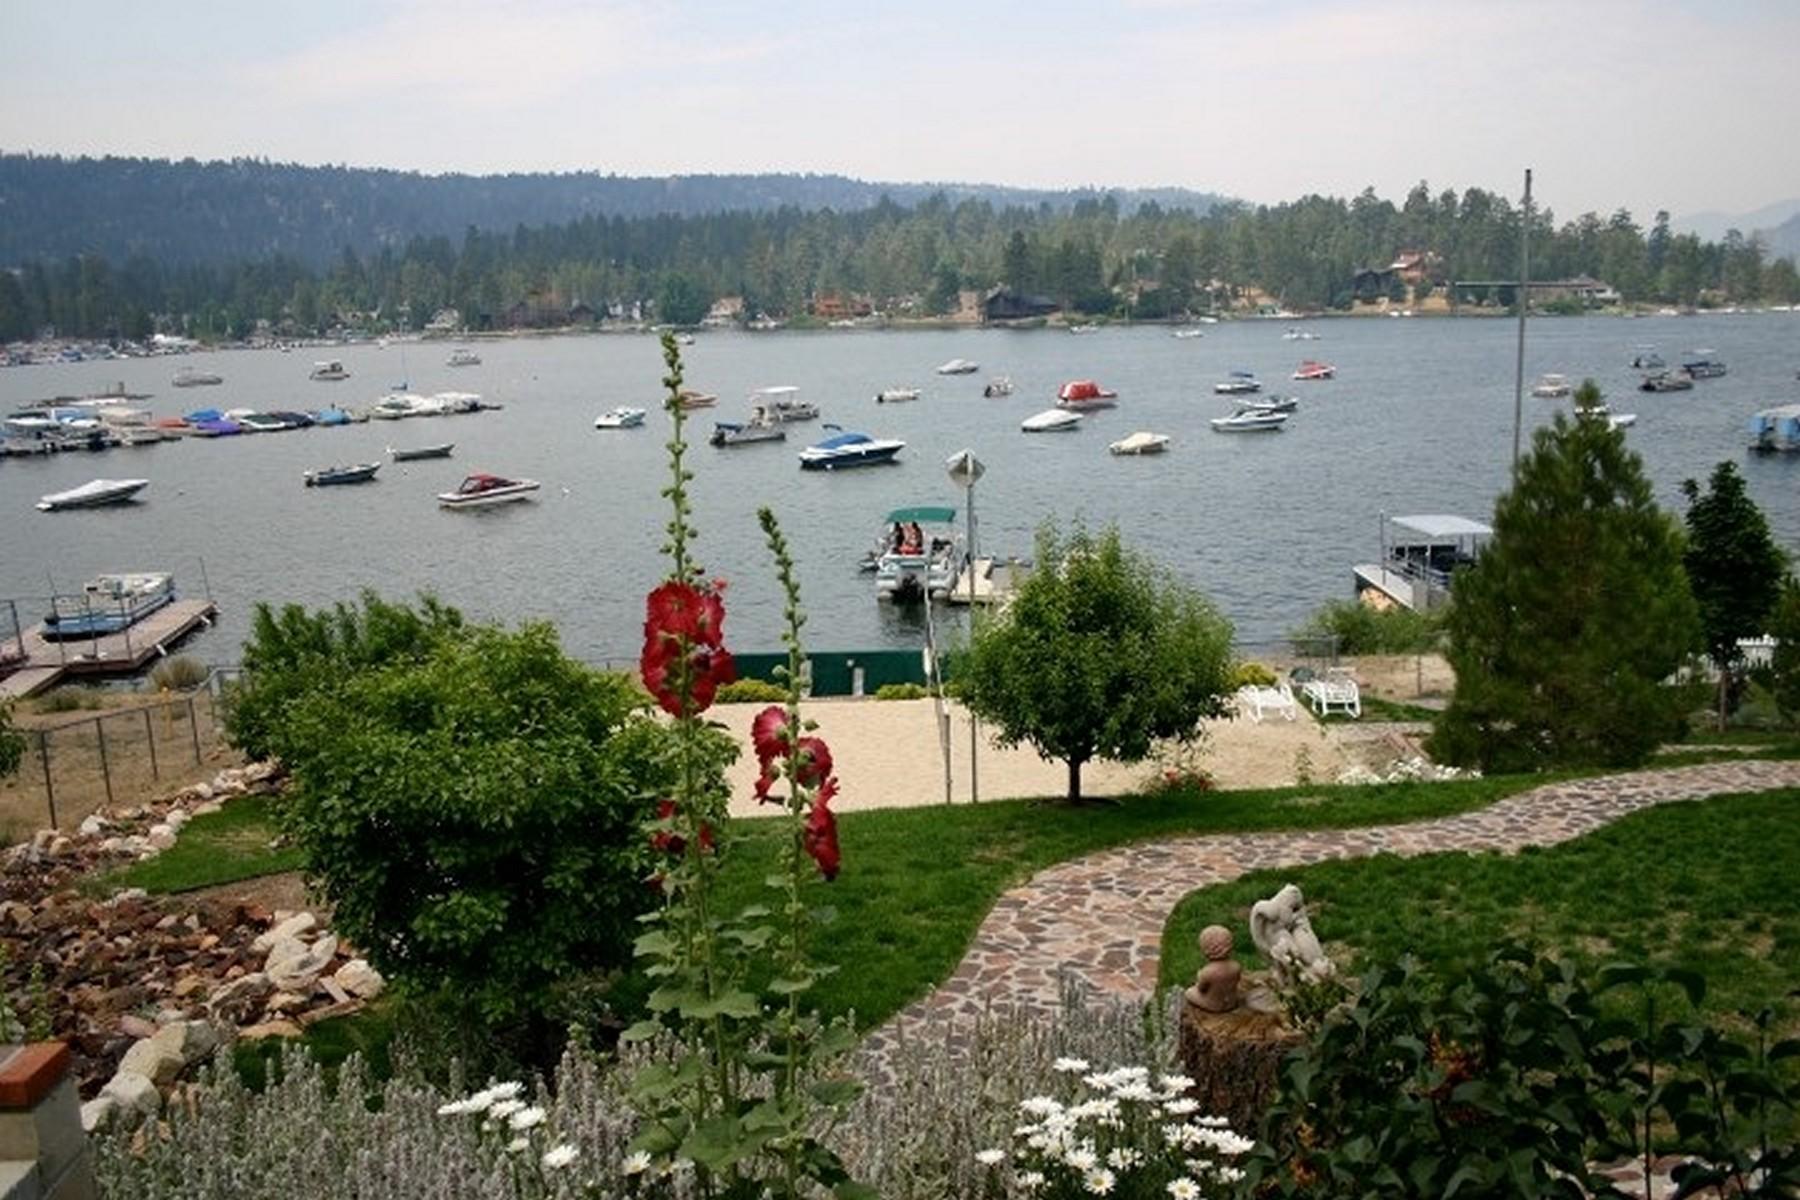 Villa per Vendita alle ore 39599 Lake Dr Big Bear Lake, California, 92315 Stati Uniti